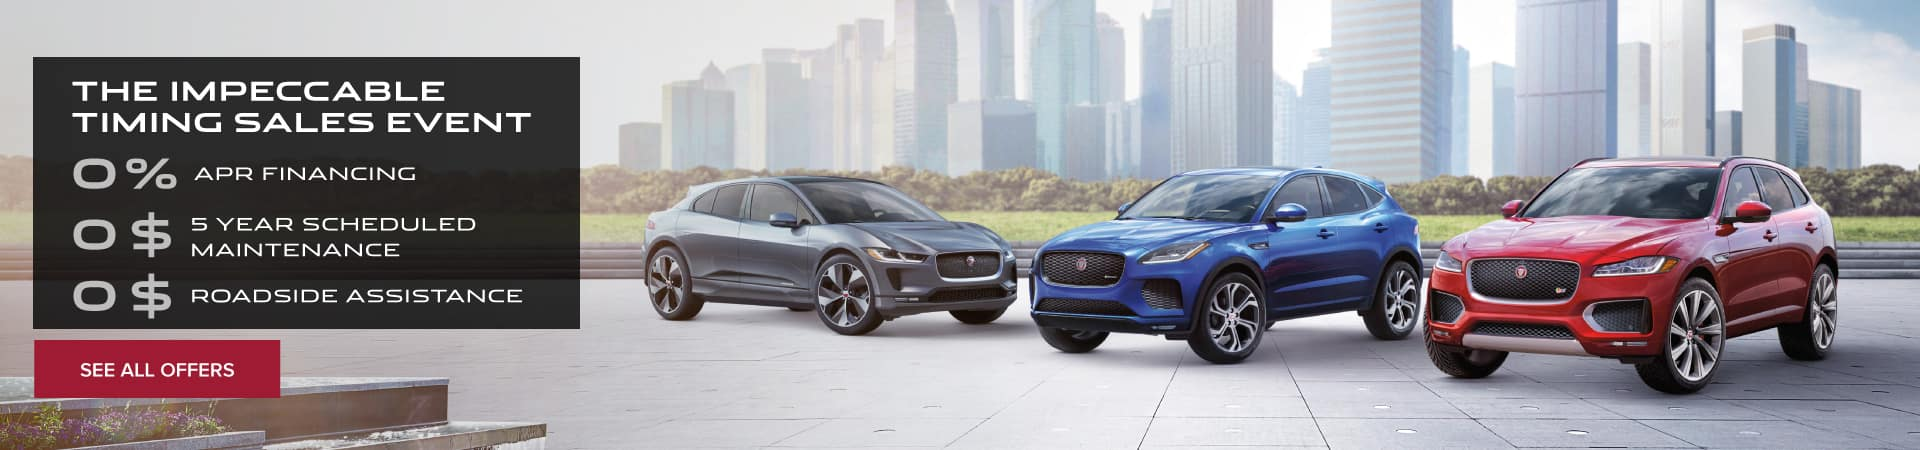 Autobahn Jaguar Fort Worth | Impeccable Timing Sales Event